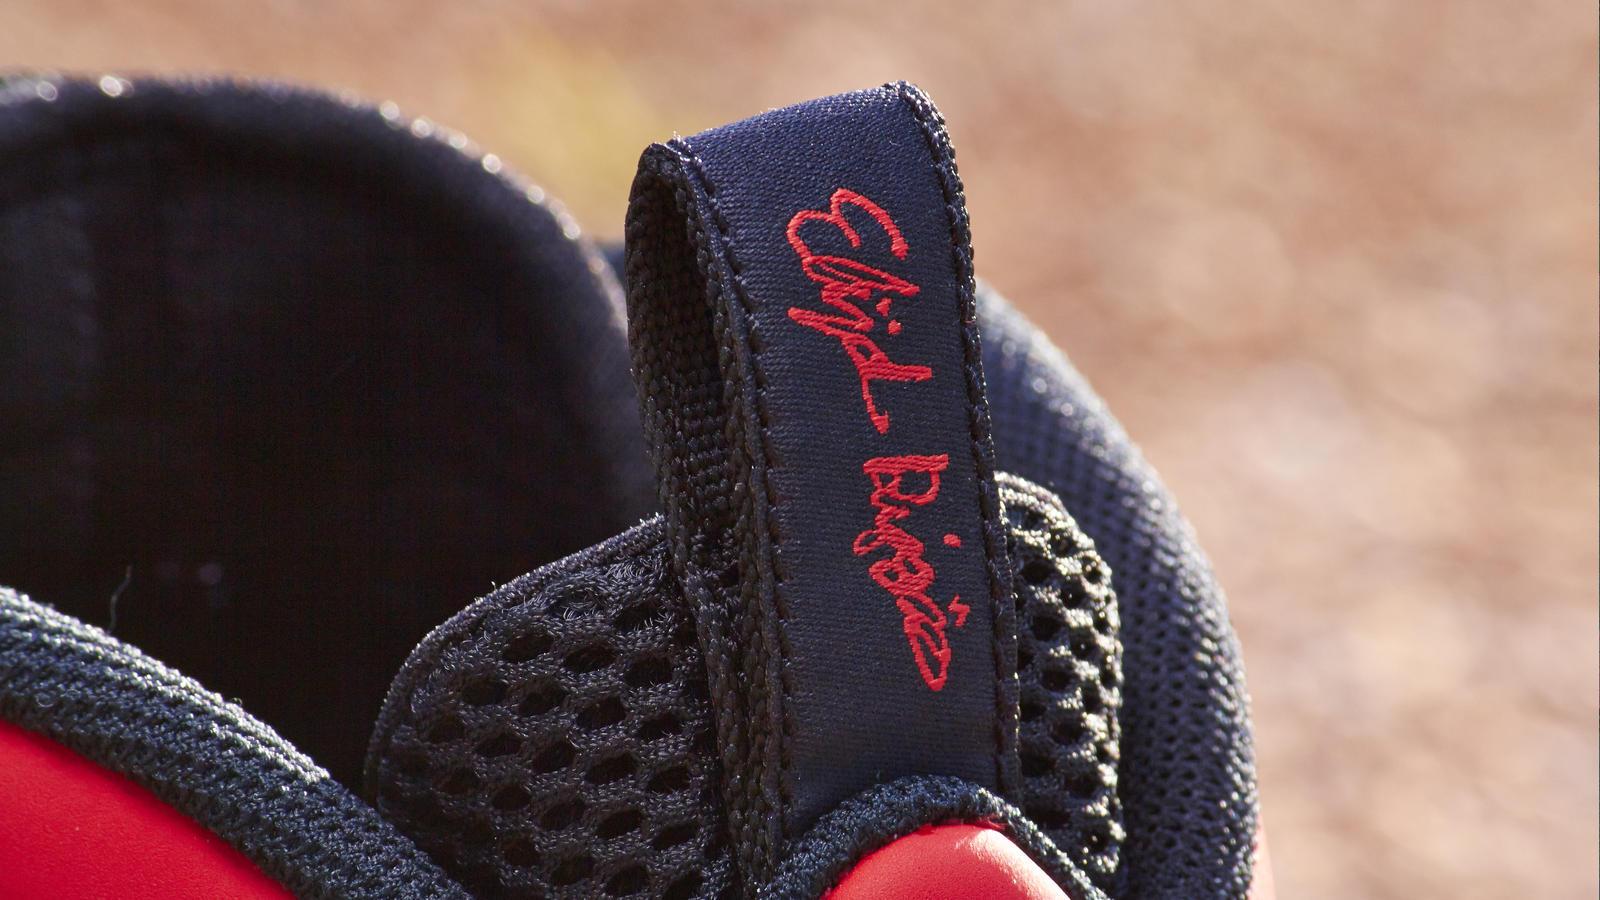 Footwear Detail V3 0044